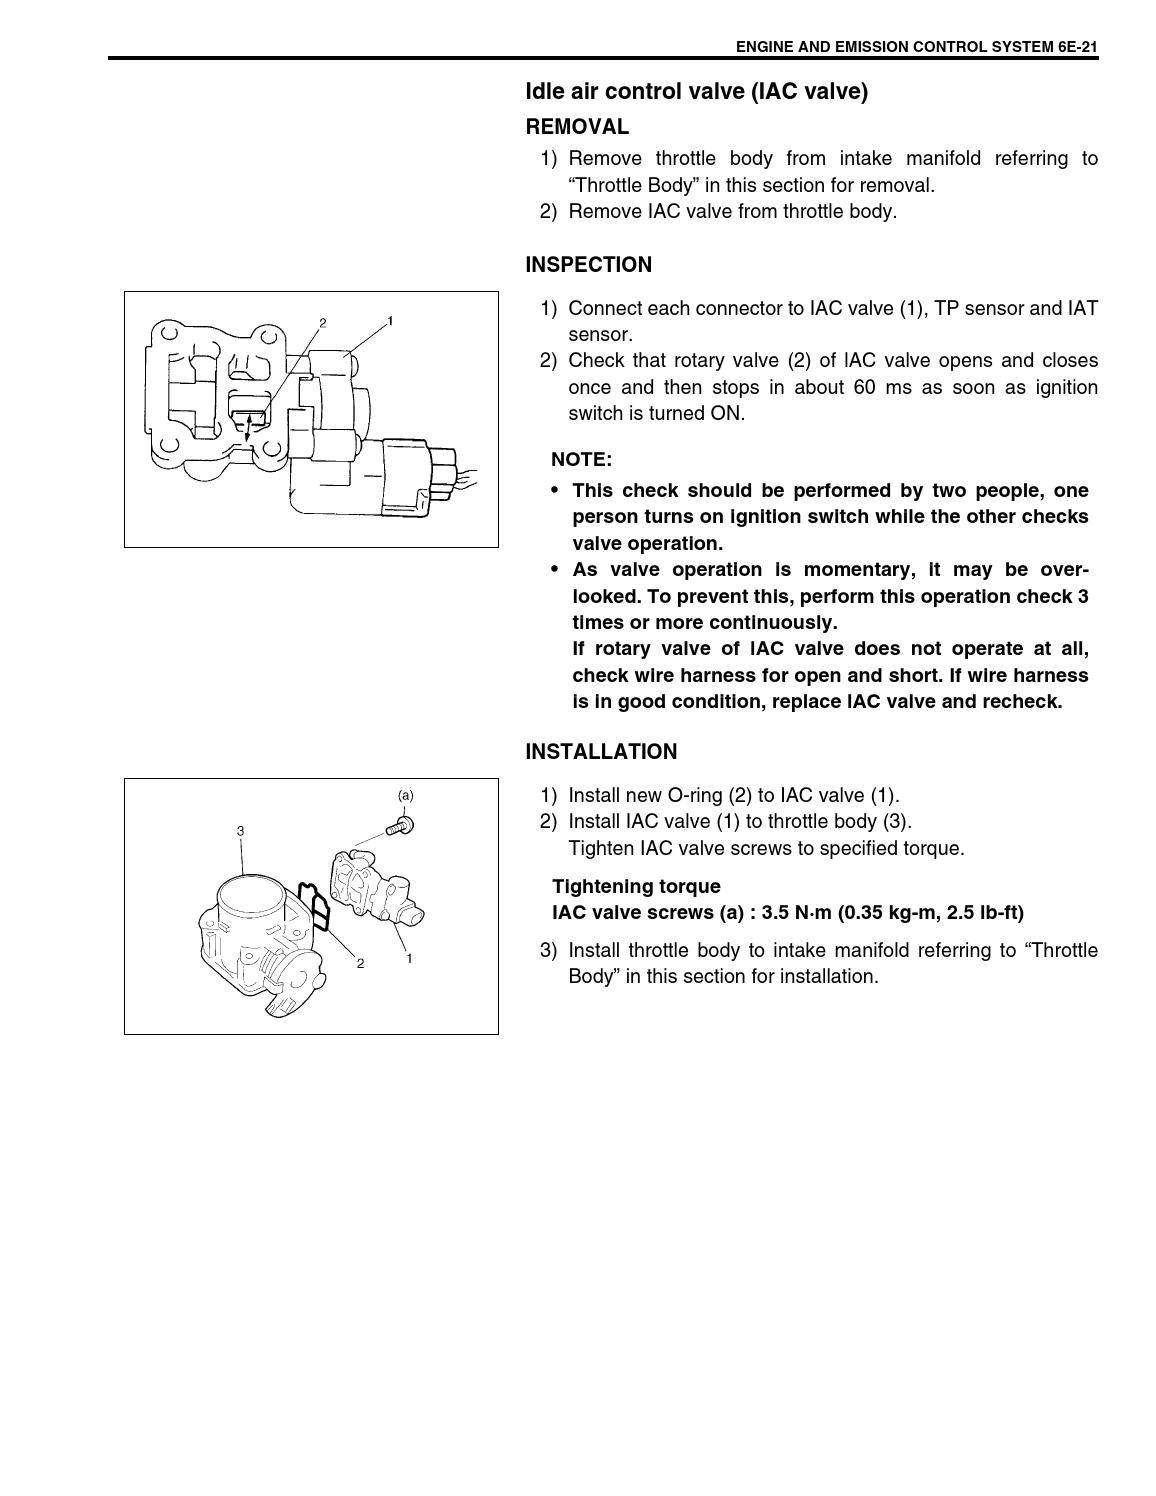 Jimny part2 3 servicemanual 99500 81a10 01e sn413